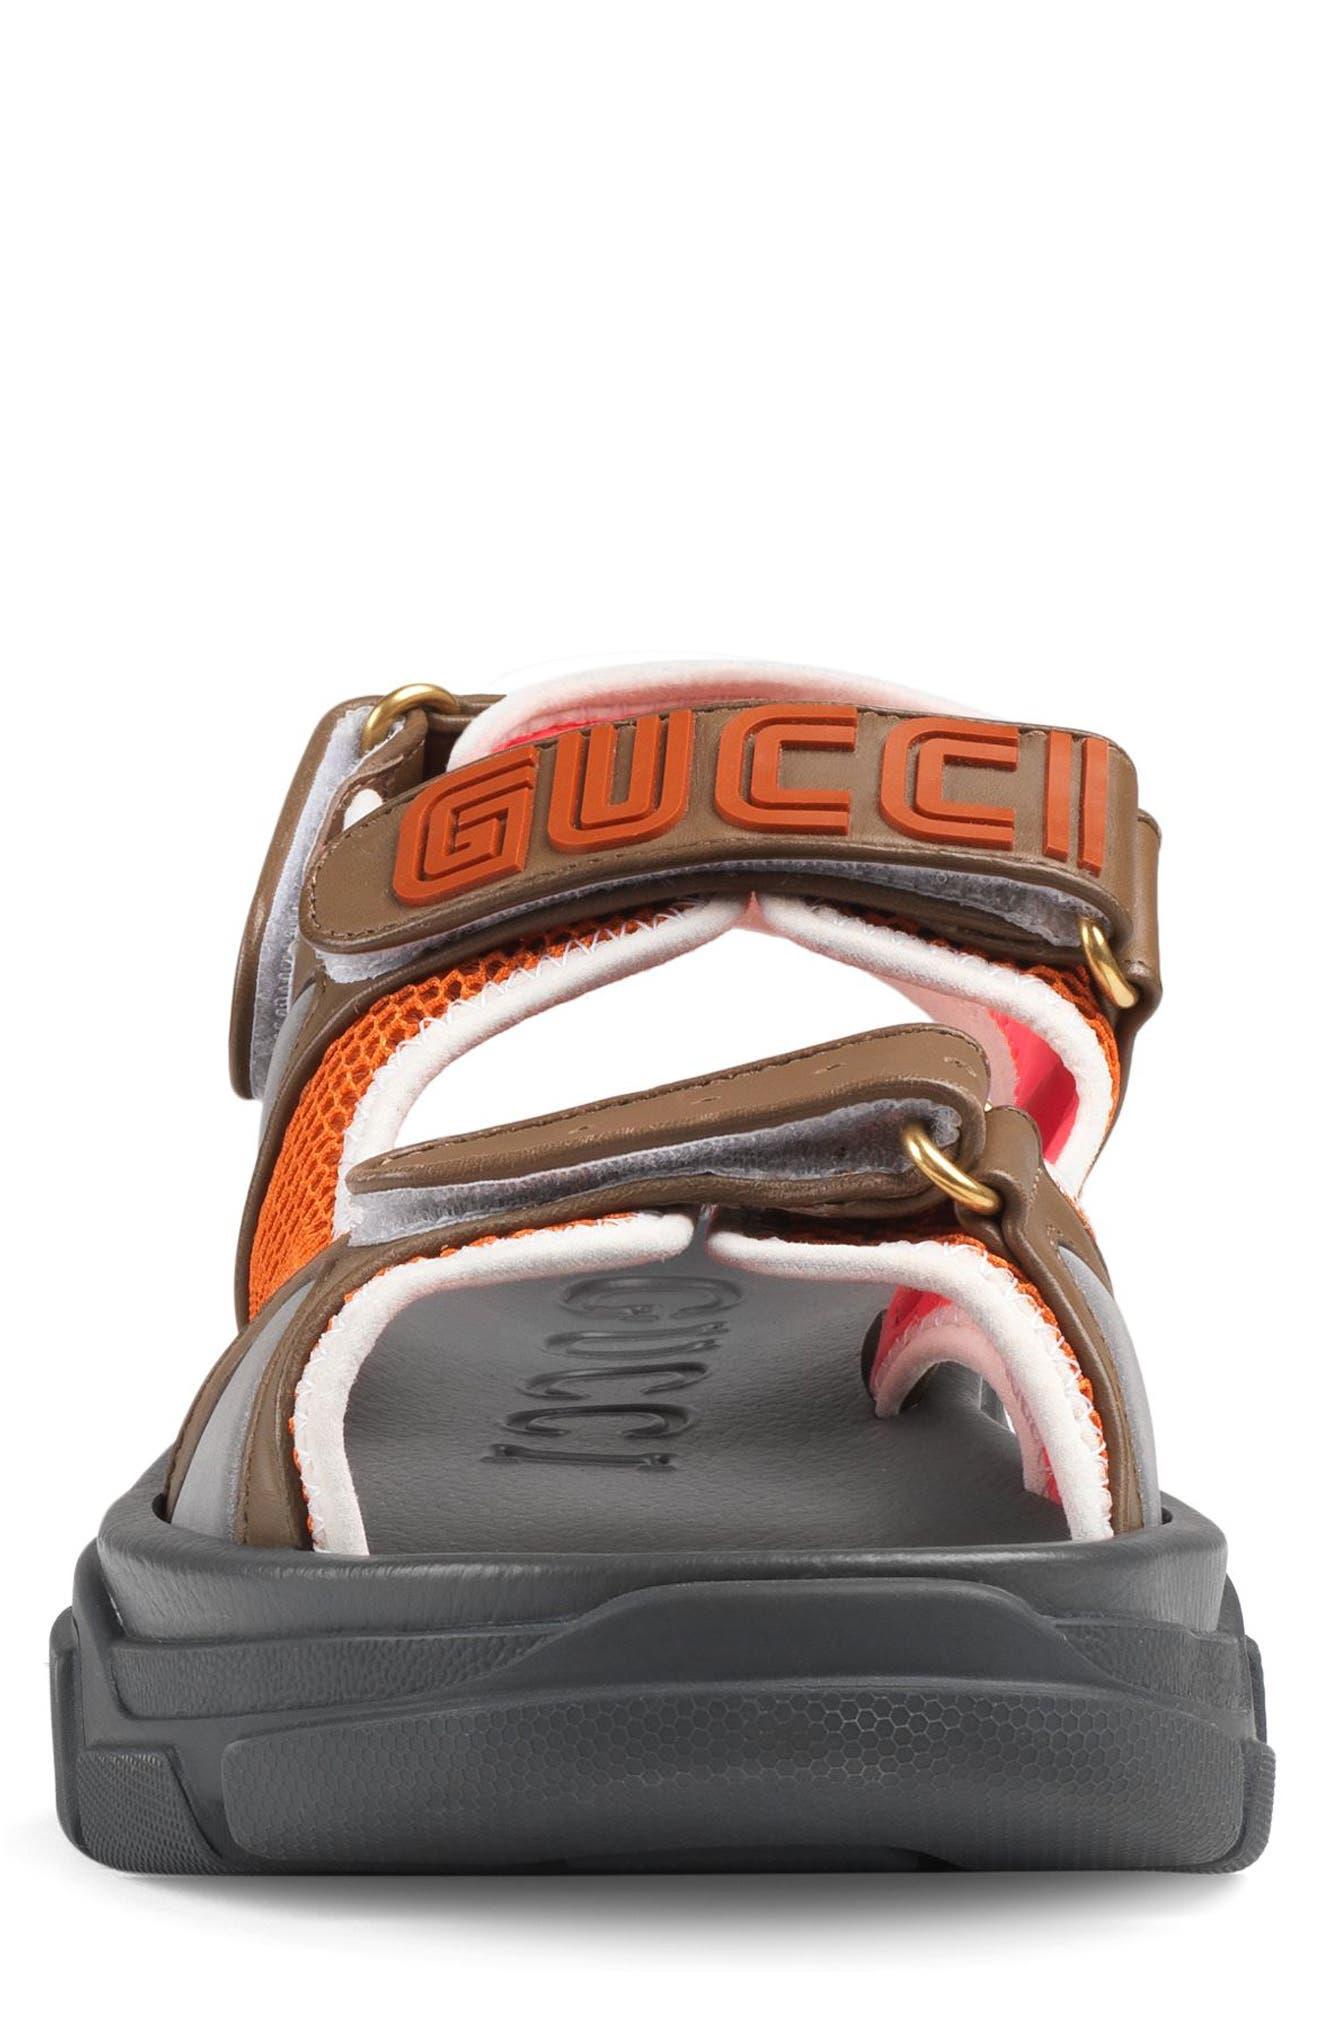 Agru Sport Sandal,                             Alternate thumbnail 3, color,                             BROWN